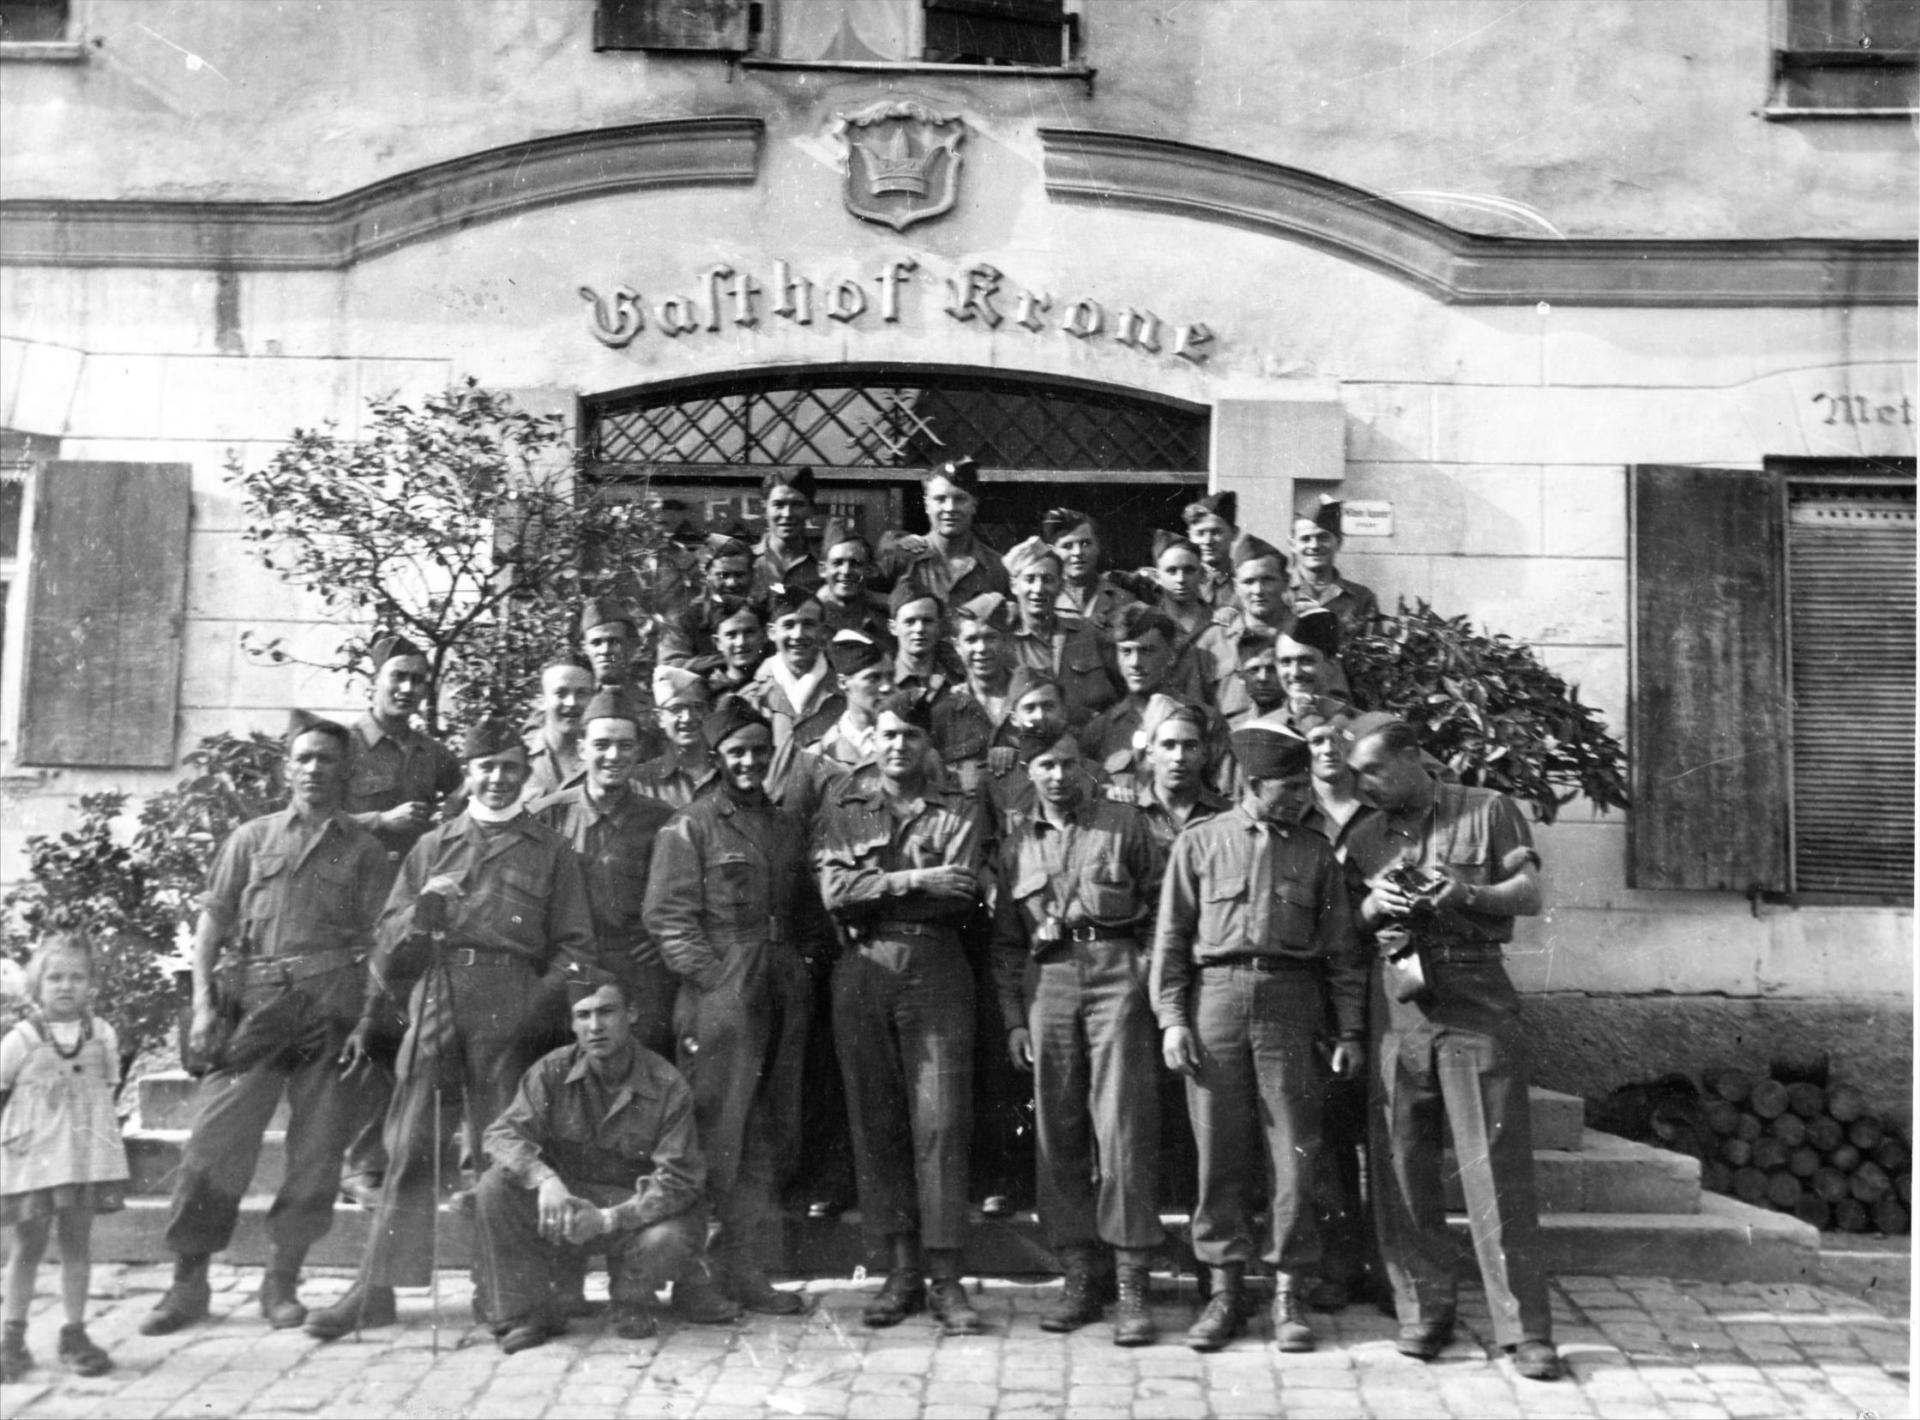 1945 05 09 le peloton caniot a oberstauffen le 9 mai 1945